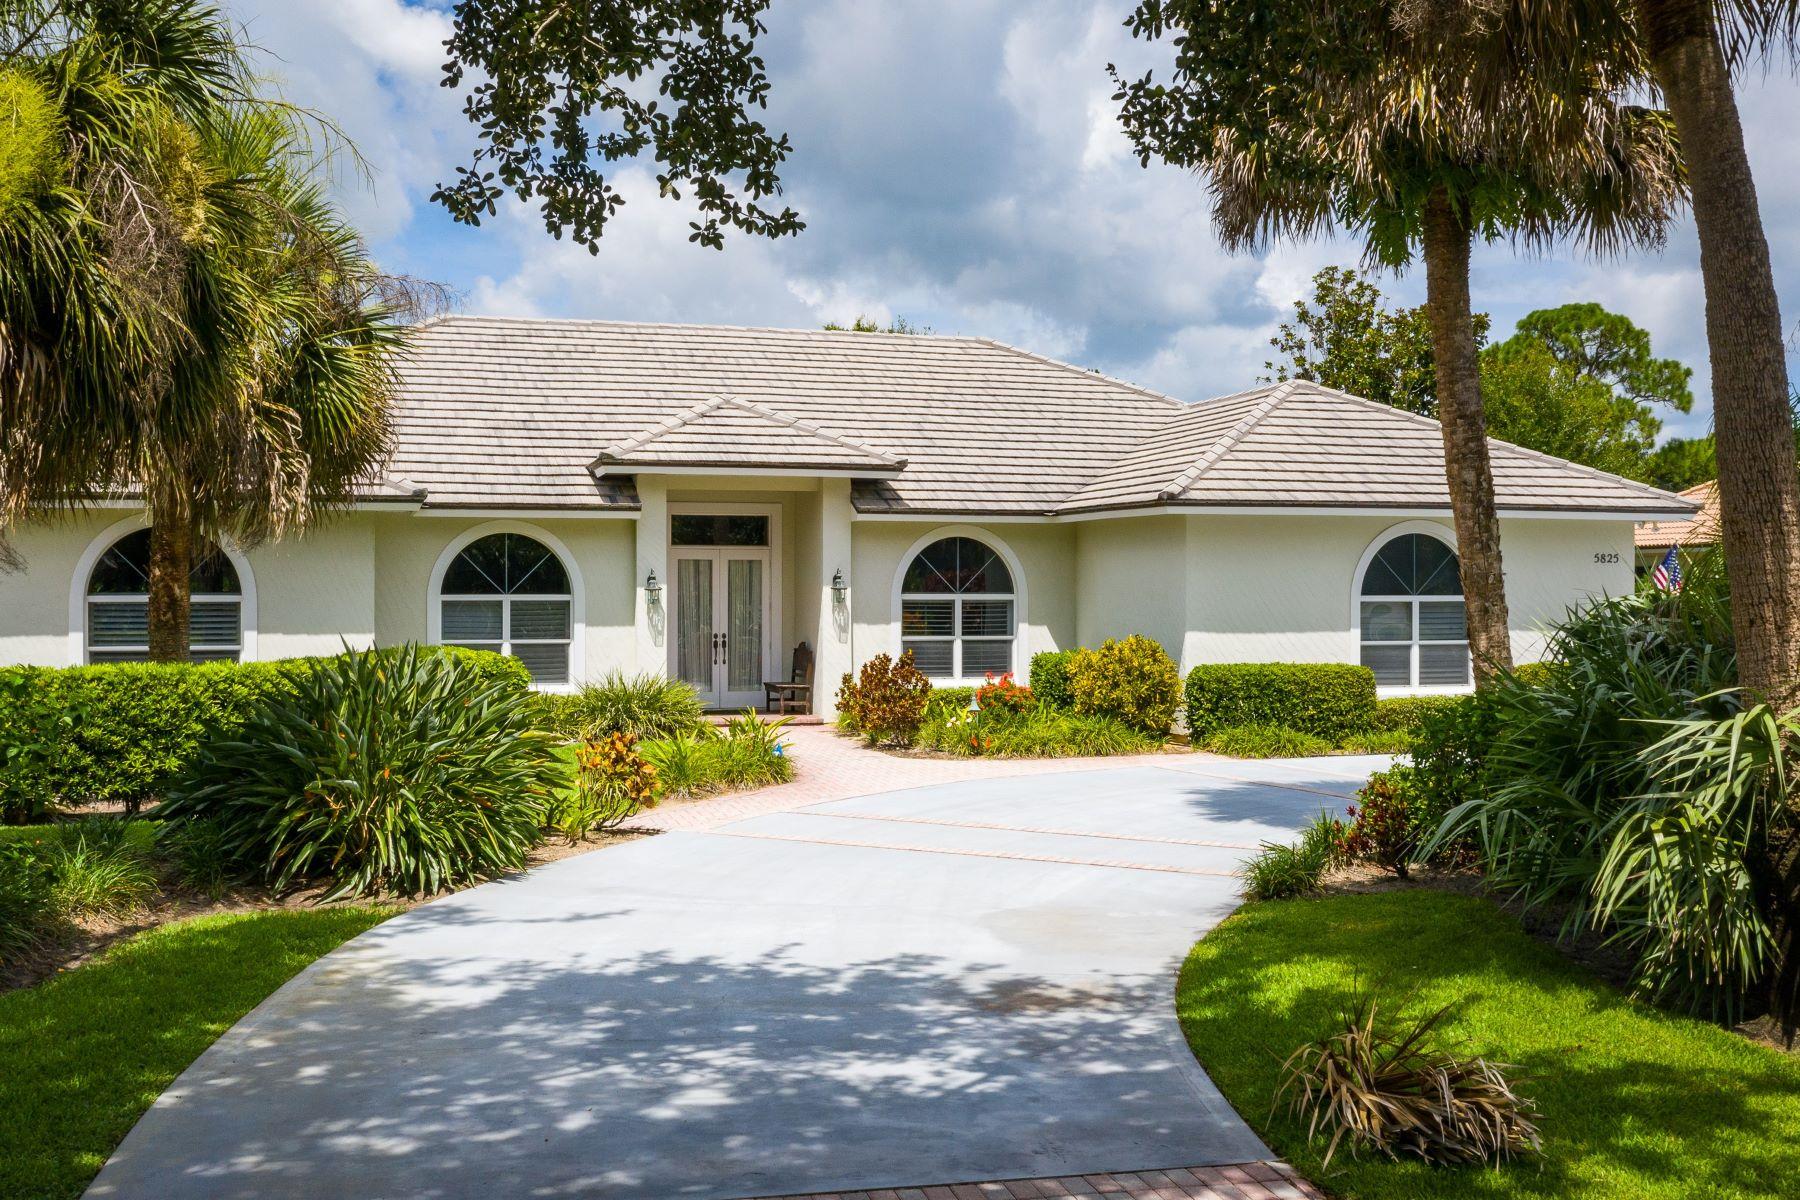 5825 Turnberry Lane, Vero Beach, FL 5825 Turnberry Lane Vero Beach, Florida 32967 Estados Unidos